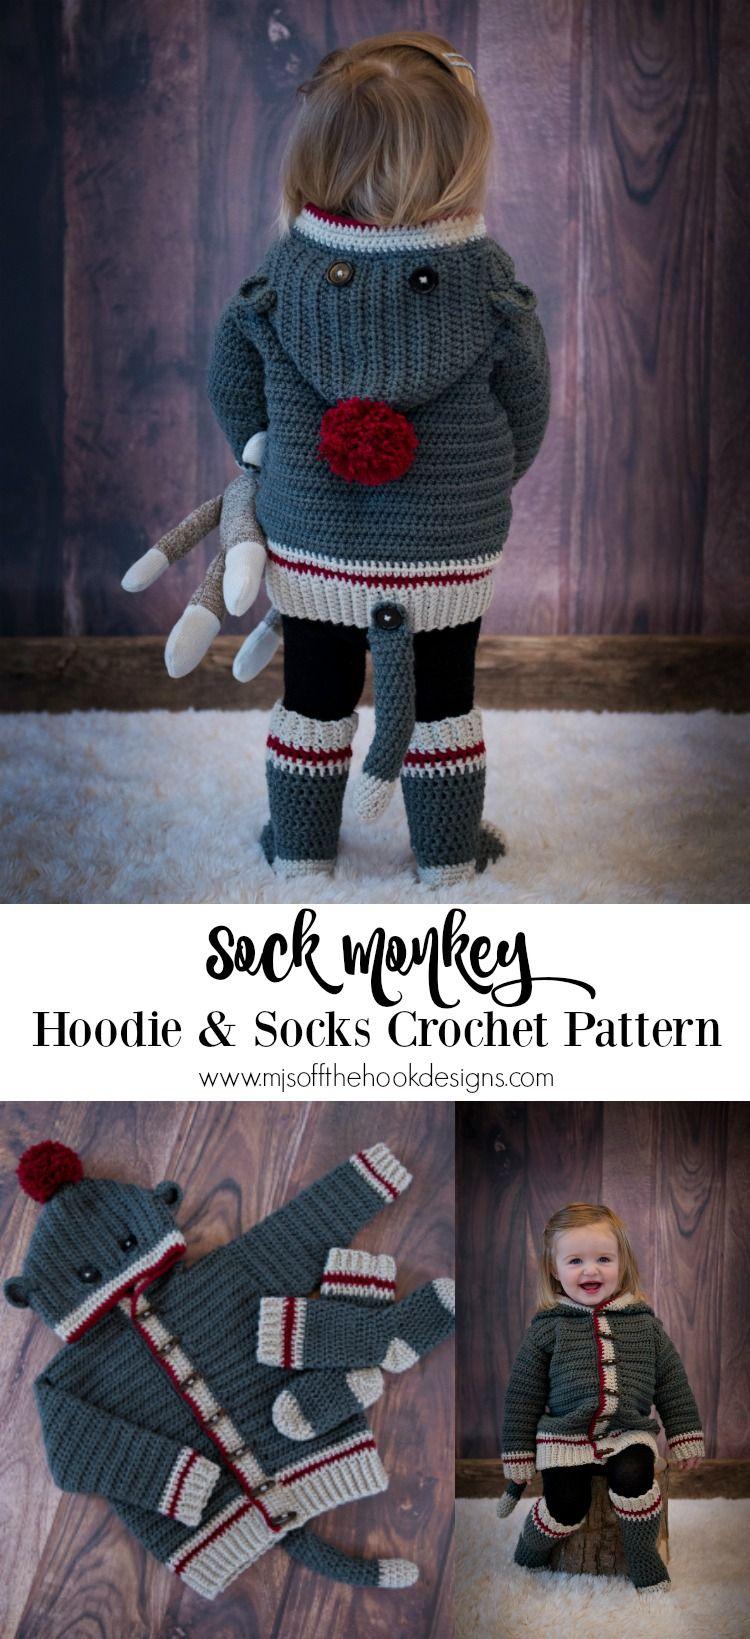 How to Crochet Sock Monkey Hoodie | Pinterest | Häkeln, Häckeln und ...